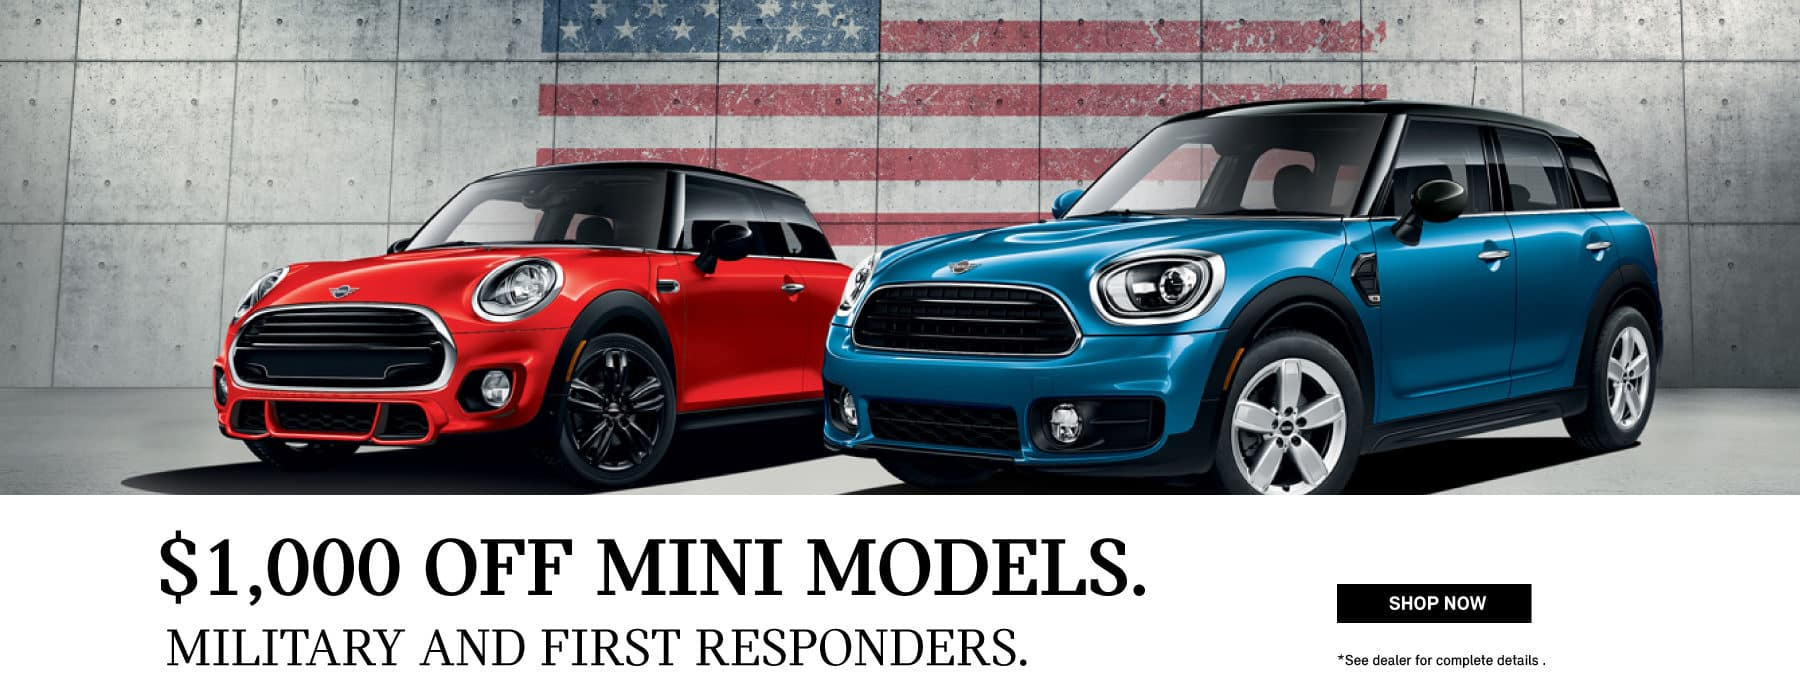 Mini Cooper Dealers >> Mini Of El Paso Tx New Used Mini Cooper Dealership Near Me